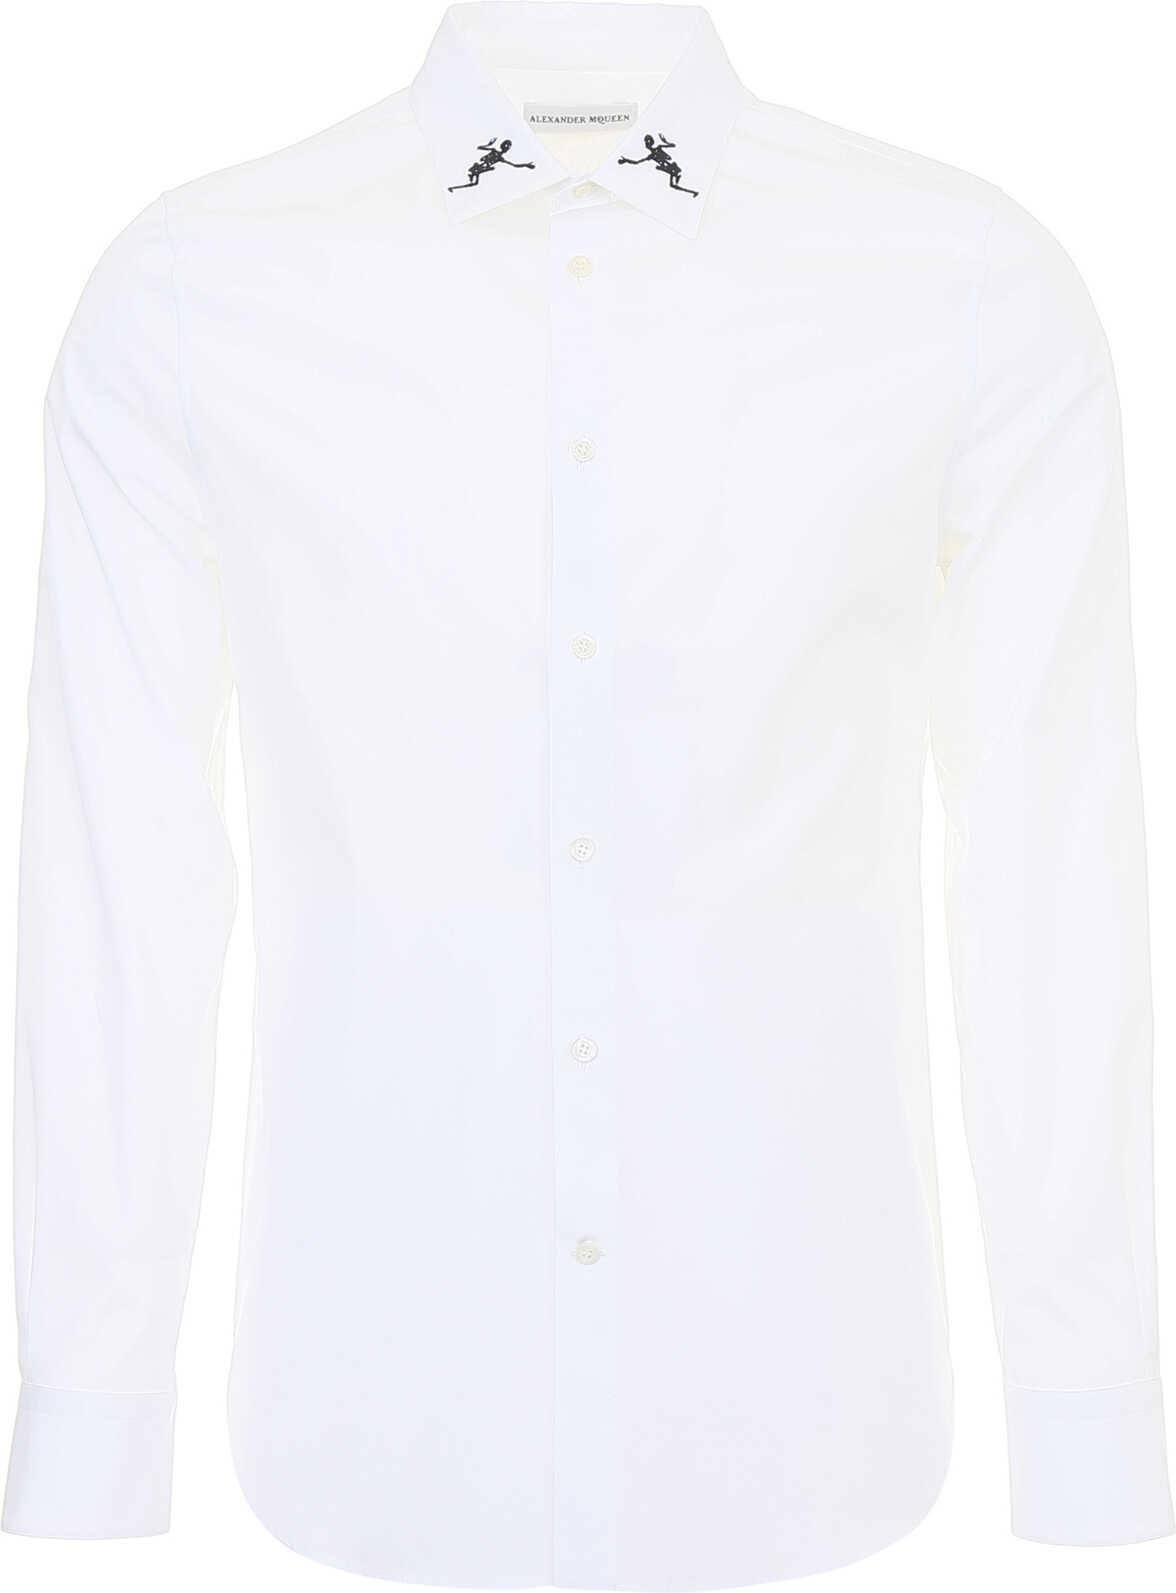 Alexander McQueen Dancing Skeleton Shirt WHITE